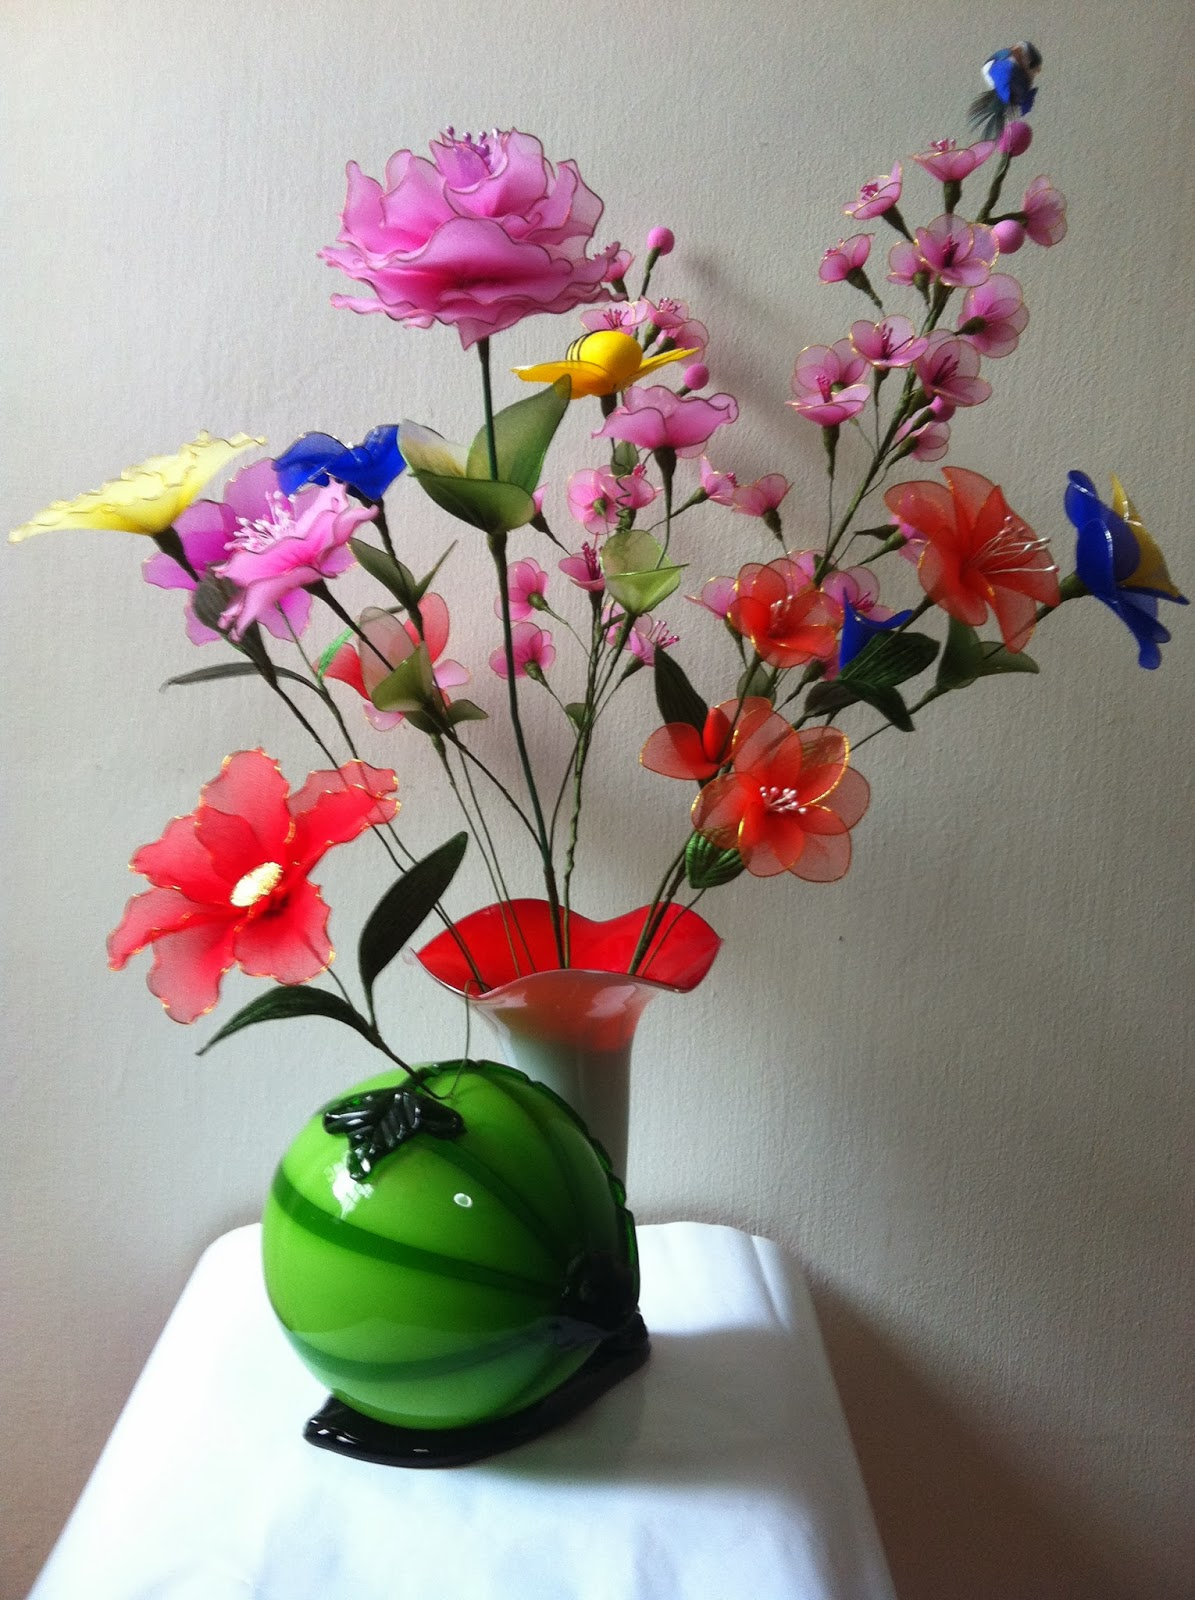 Handmade Stocking Flowers Singapore Watermelong Vase